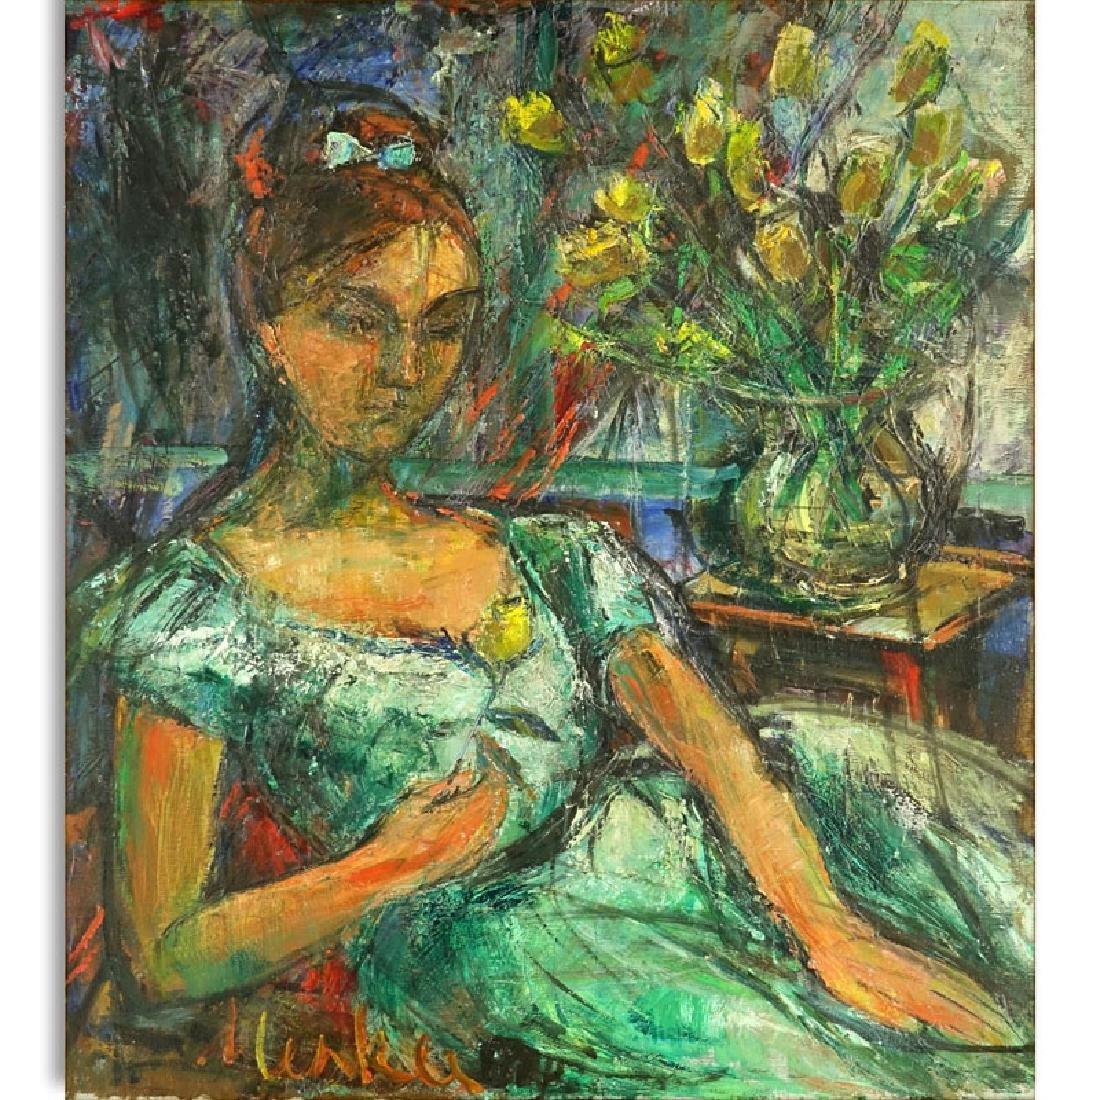 Attributed to: Sigmund Menkes, Polish (1896 - 1986) Oil